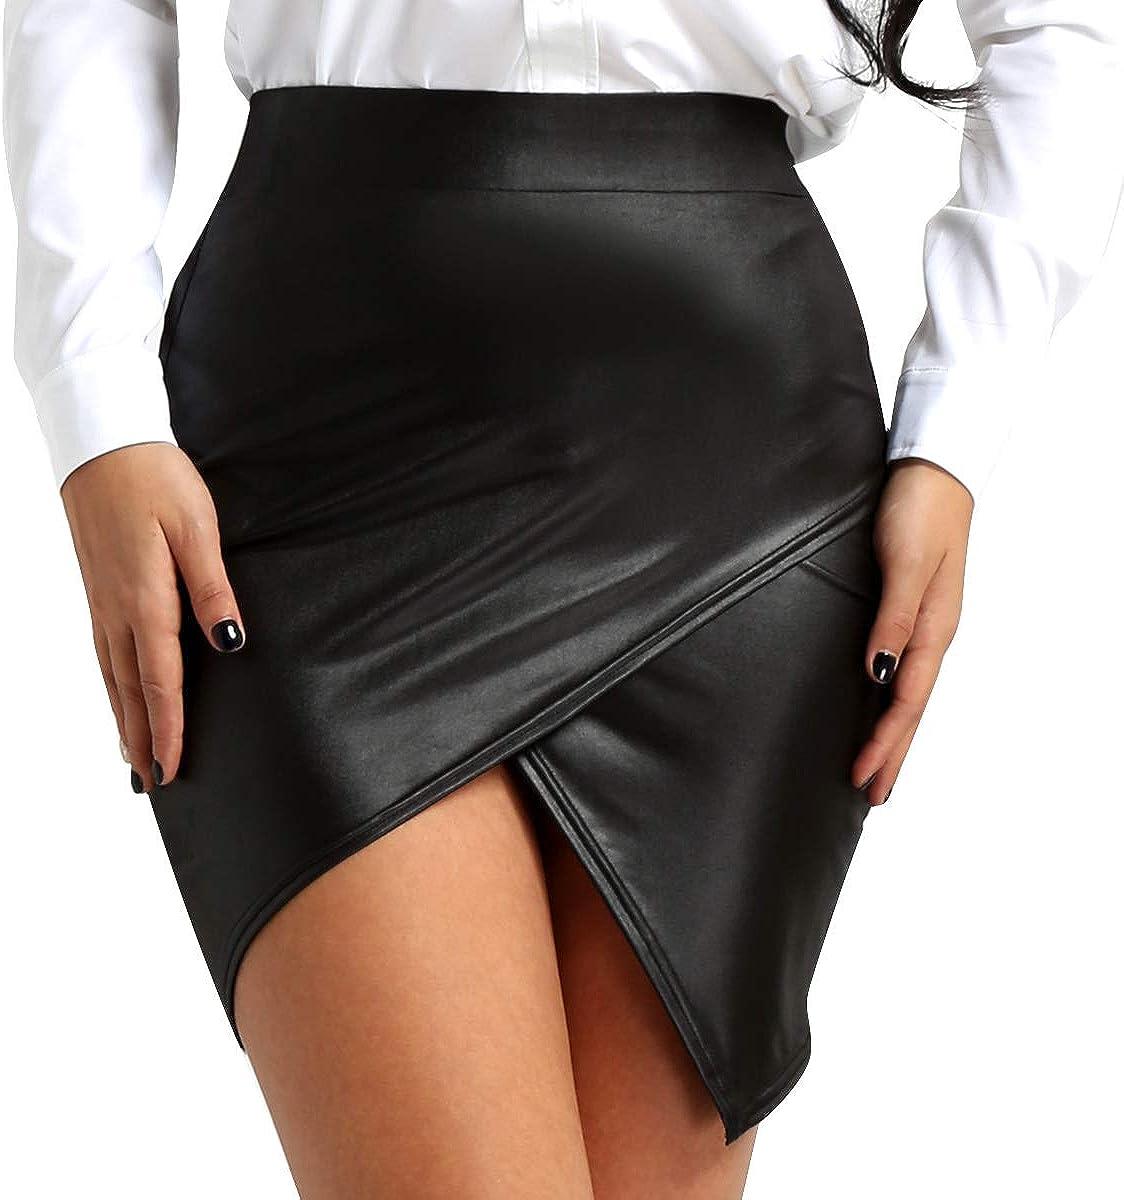 inhzoy Women's Faux Leather High Waist Night Out Clubwear Asymmetric Booty Mini Pencil Skirts